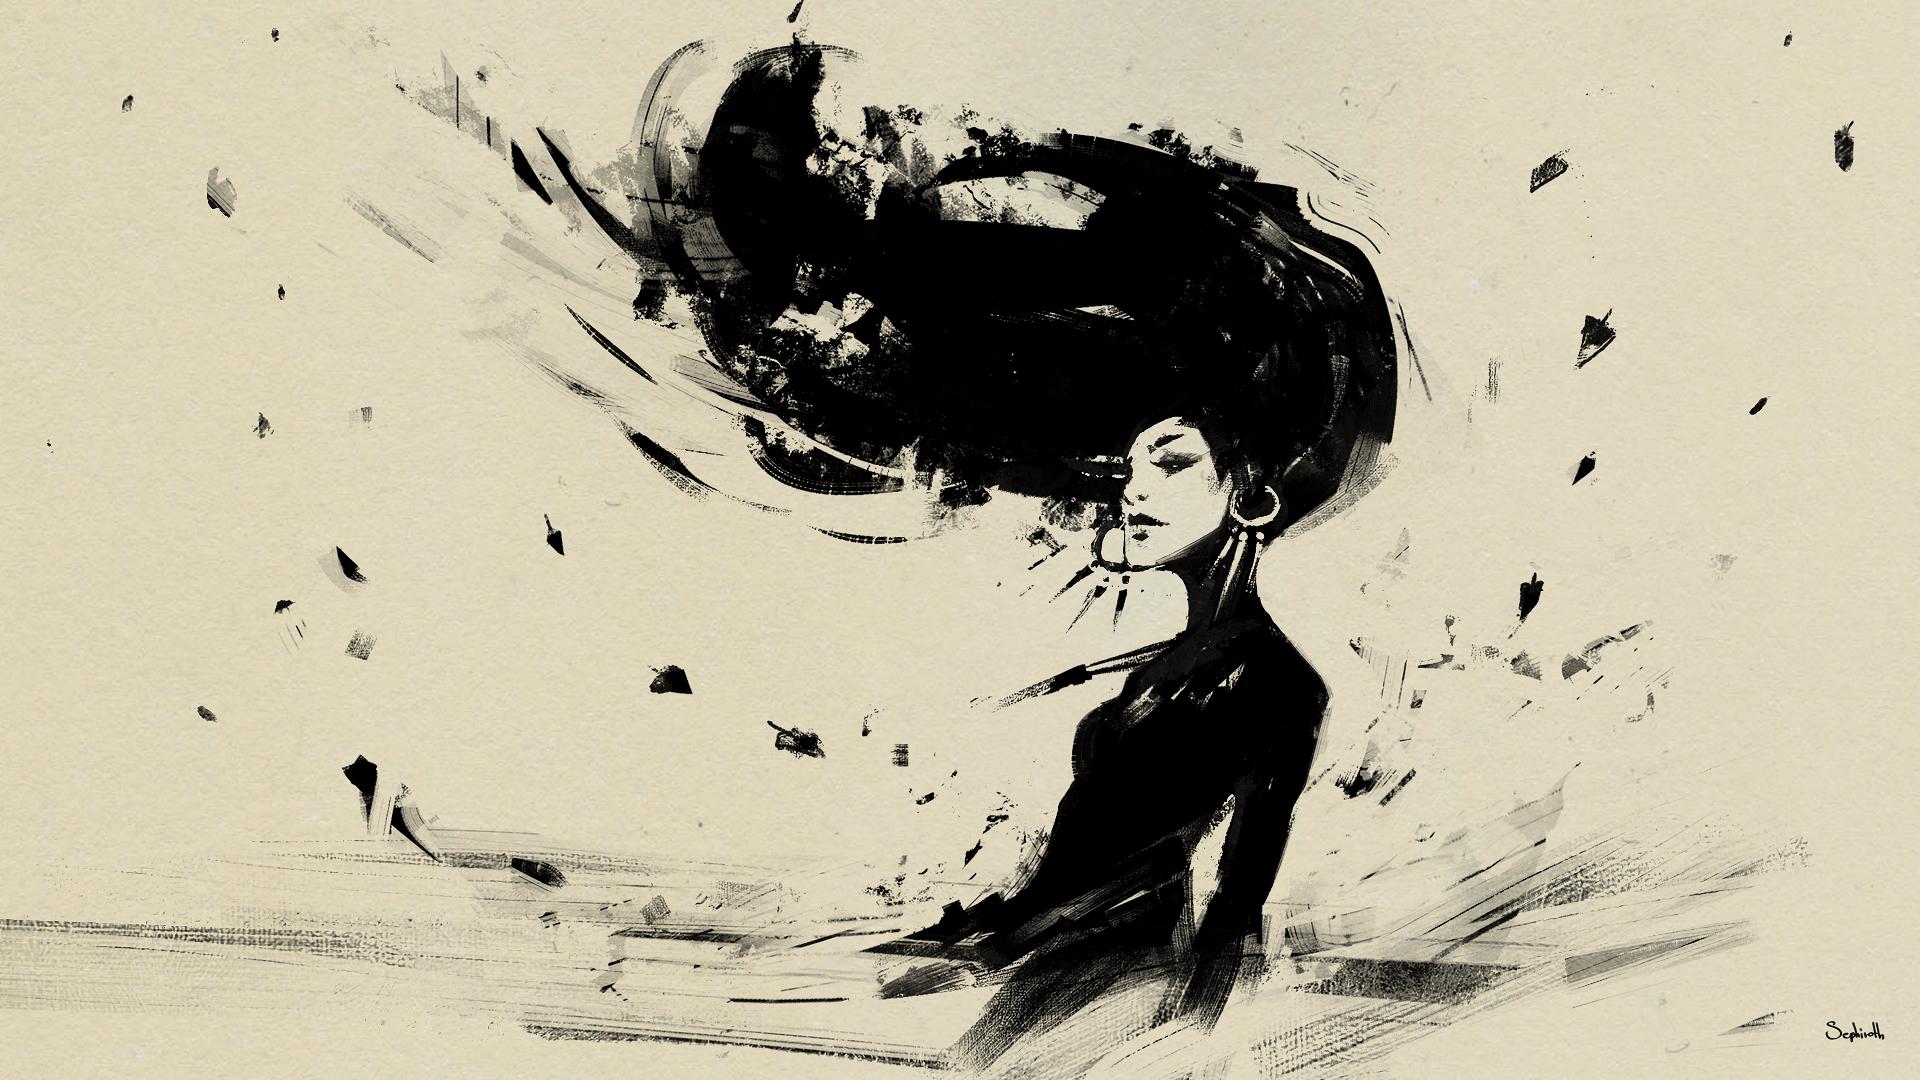 Wind by Sephiroth-Art